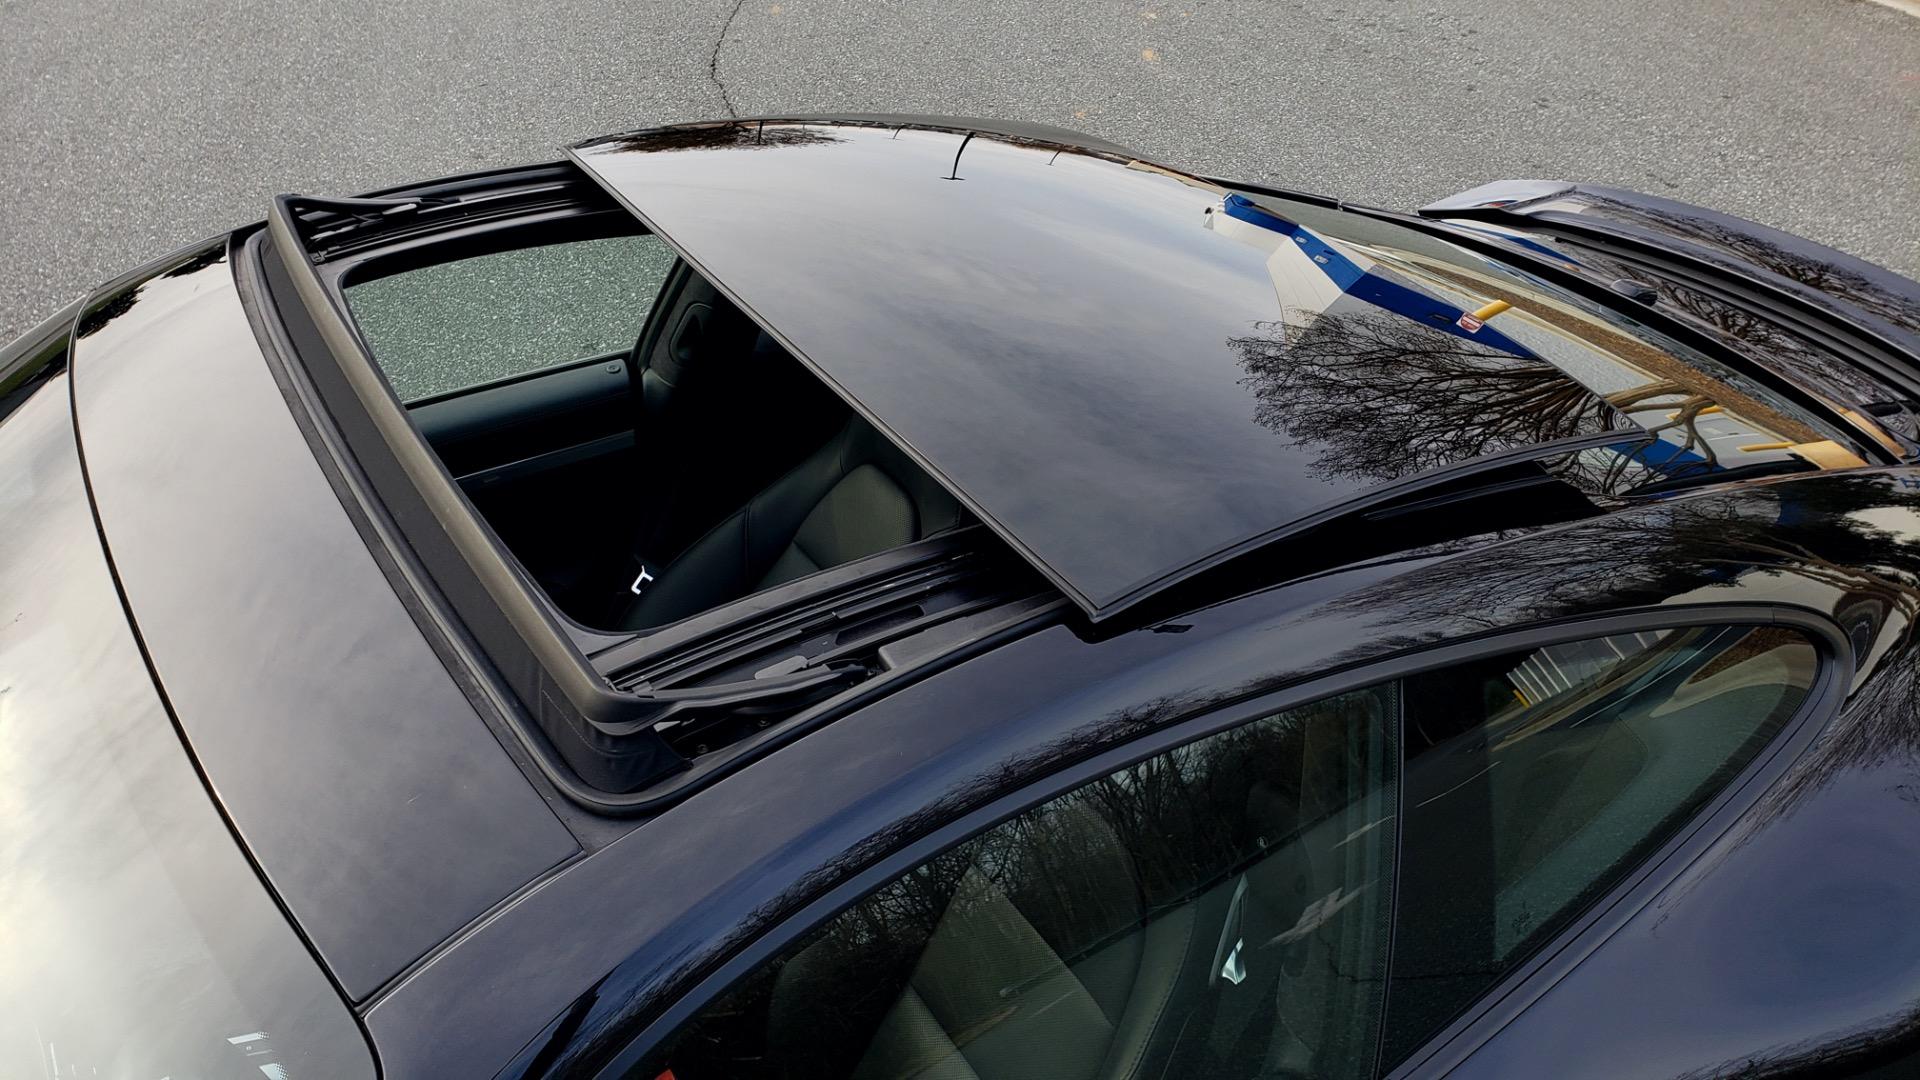 Used 2014 Porsche 911 CARRERA 4S / PREM PKG PLUS / NAV / SUNROO / BOSE / CHRONO for sale Sold at Formula Imports in Charlotte NC 28227 21